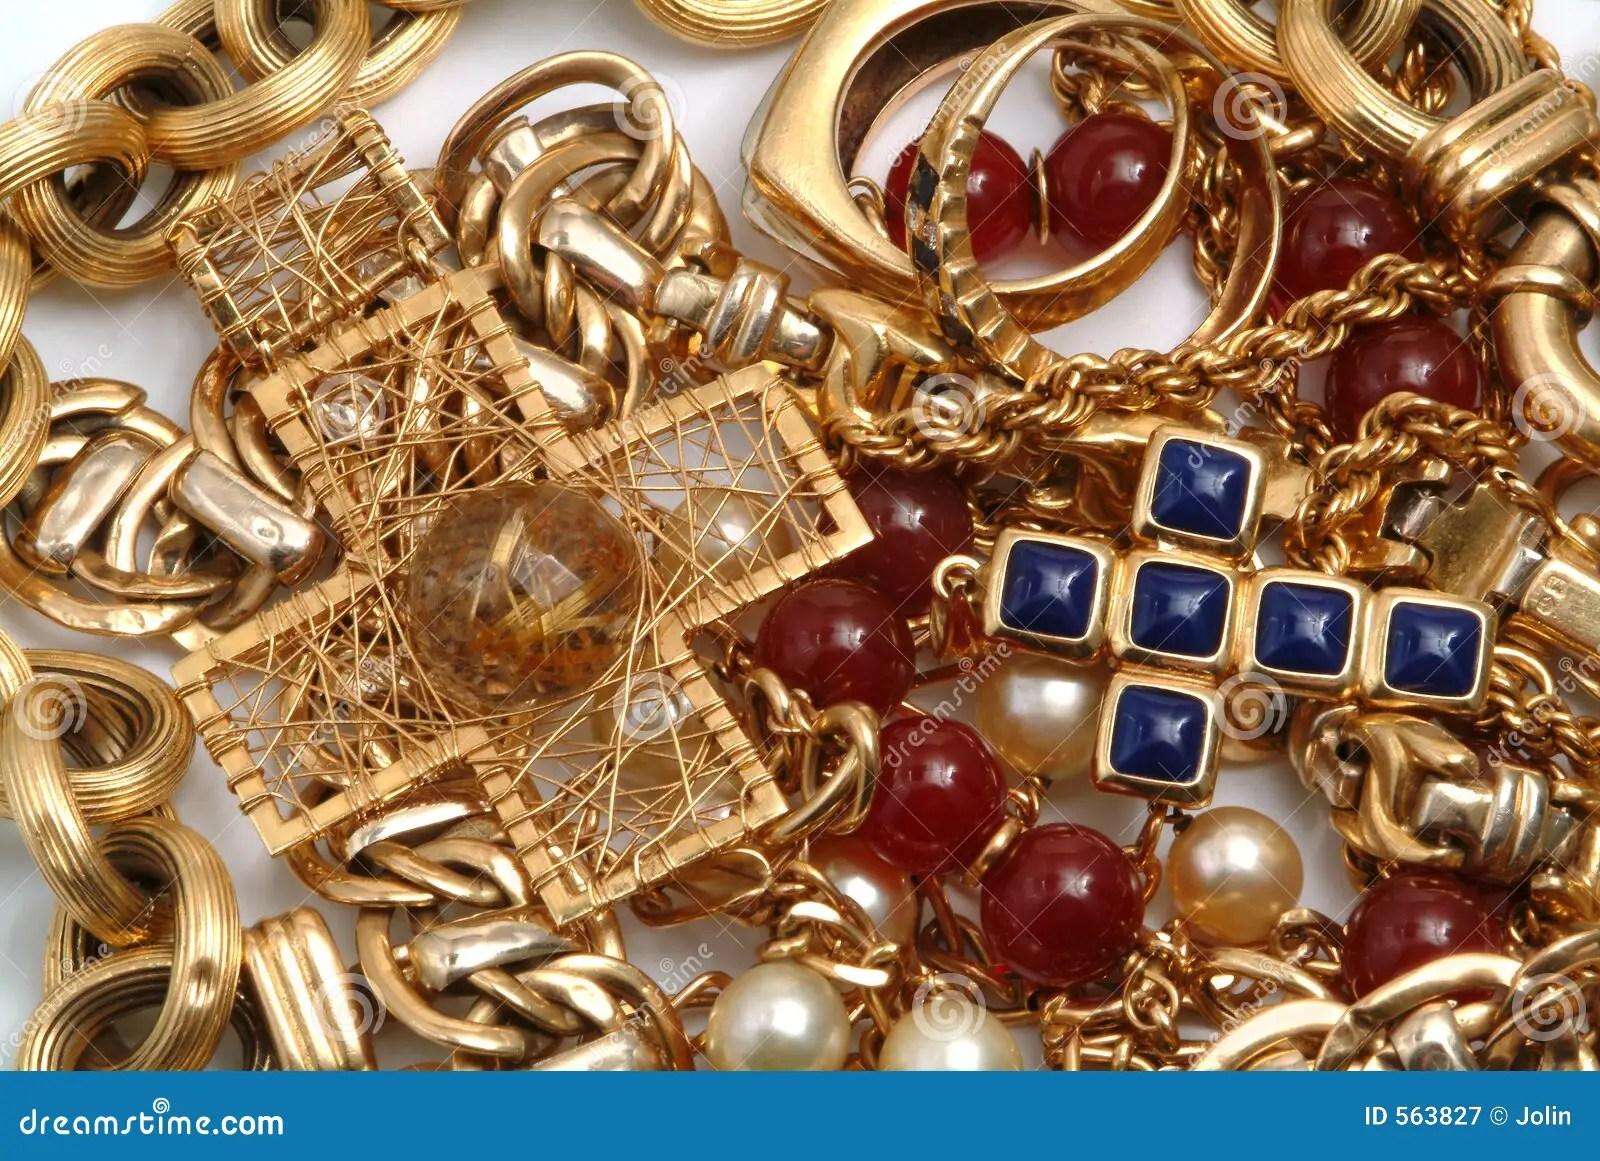 Golden Treasure Royalty Free Stock Photography Image 563827